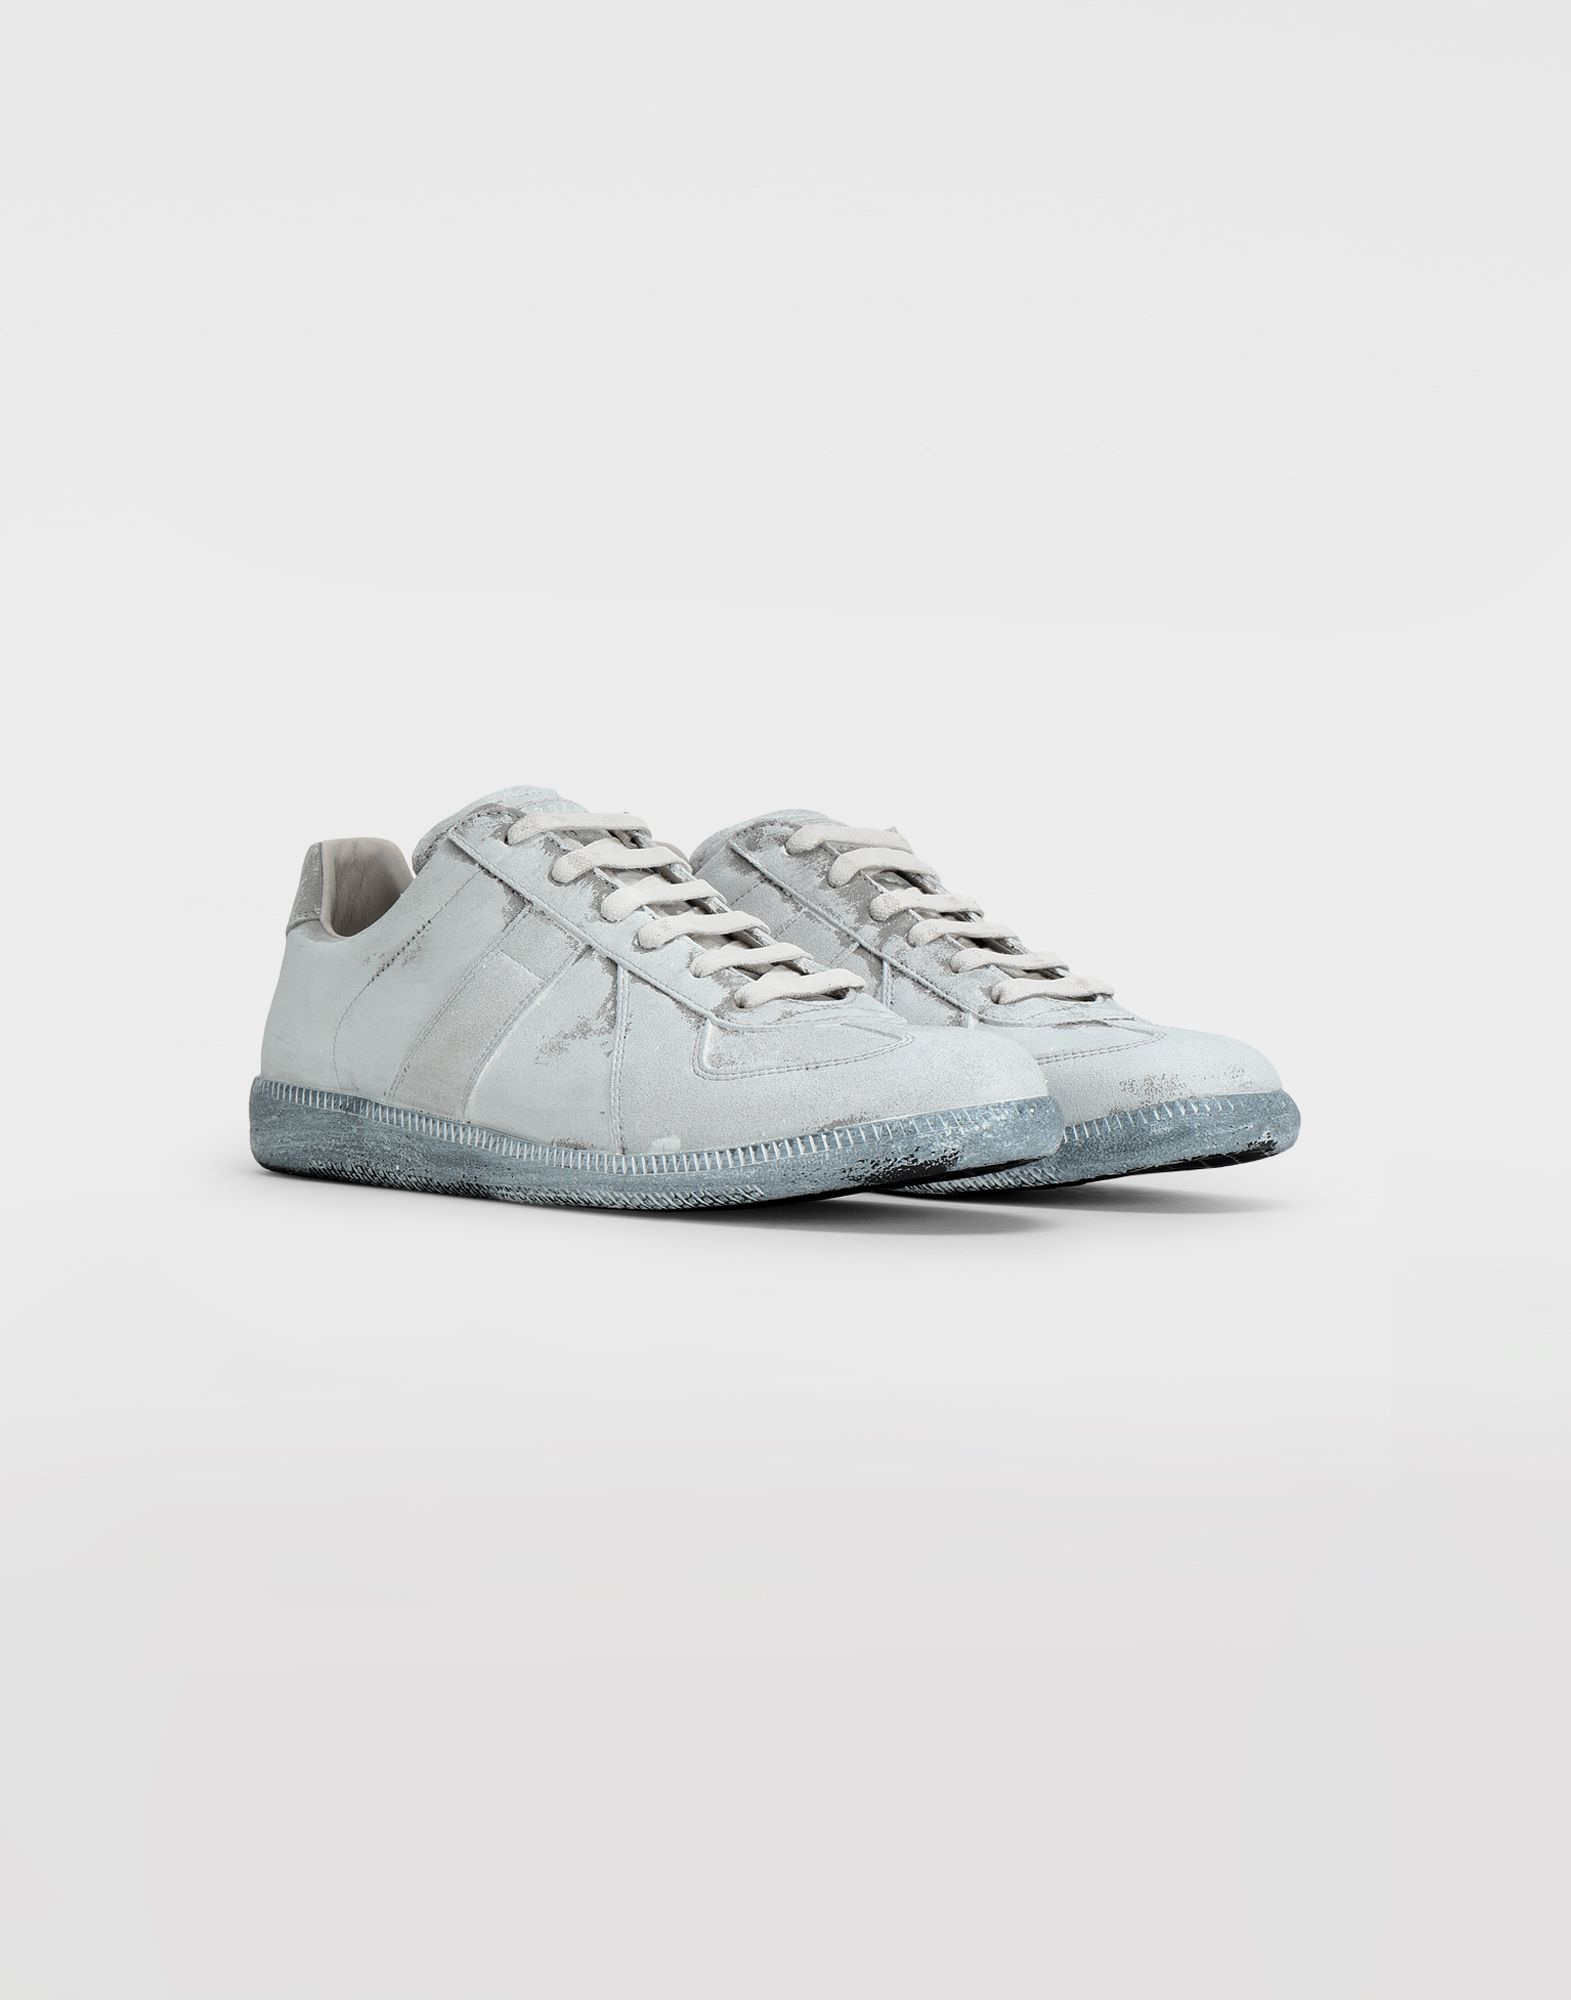 MAISON MARGIELA Replica suede sneakers Sneakers Man d